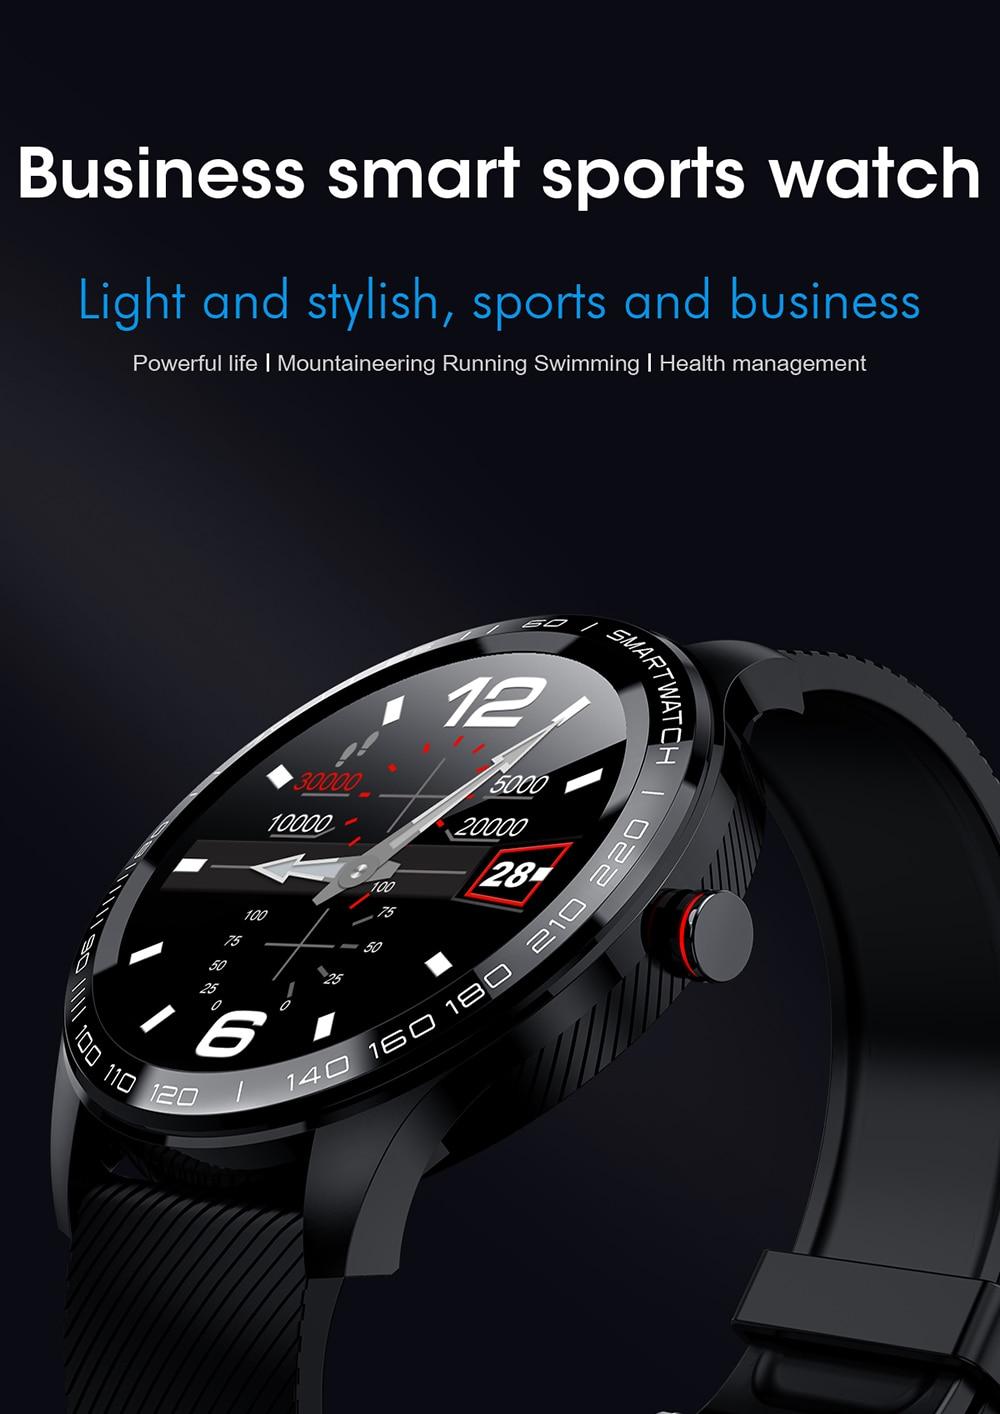 Hbf4eabbb88bd416ead5d5e3e92e18b40S 696 L9 Full touch Smart Watch Men ECG+PPG Heart Rate Blood Pressure oxygen Monitor IP68 Waterproof Bluetooth Smart Bracelet